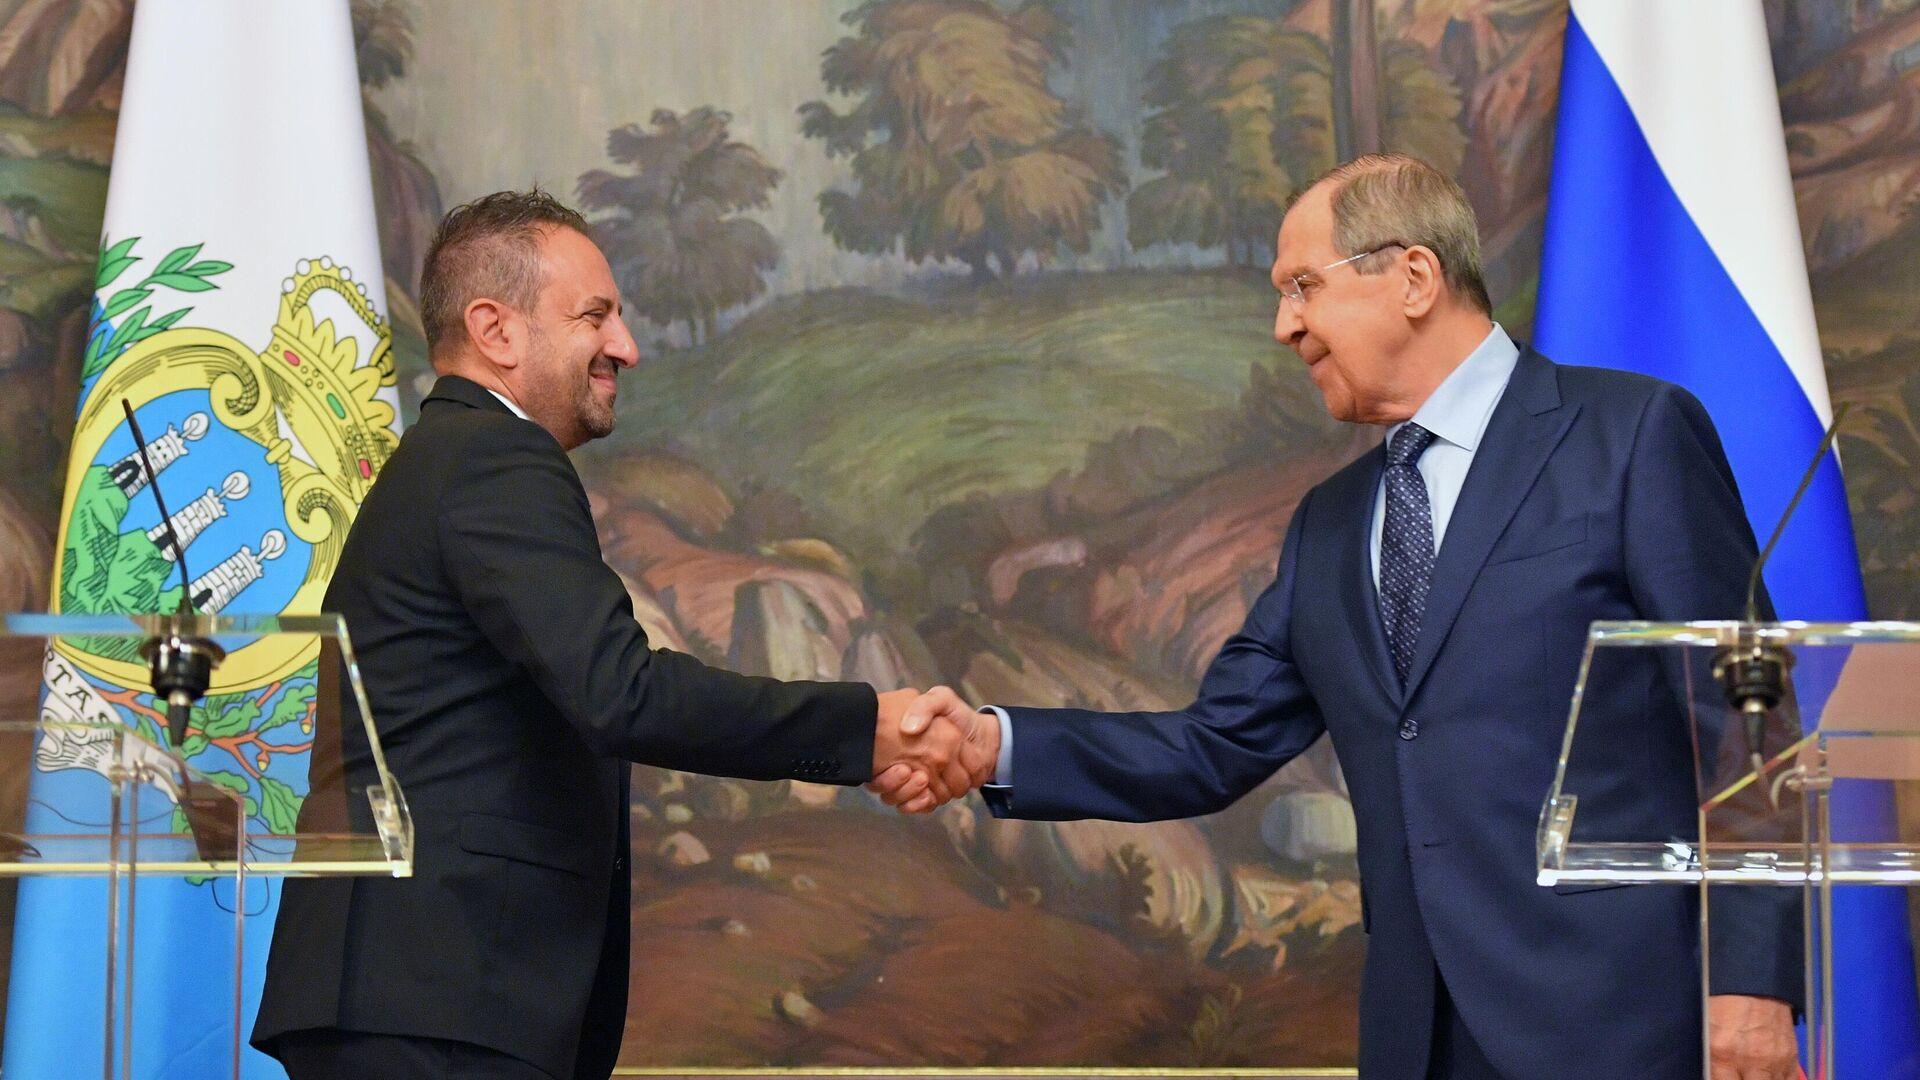 Lavrov e Beccari a Mosca - Sputnik Italia, 1920, 13.09.2021